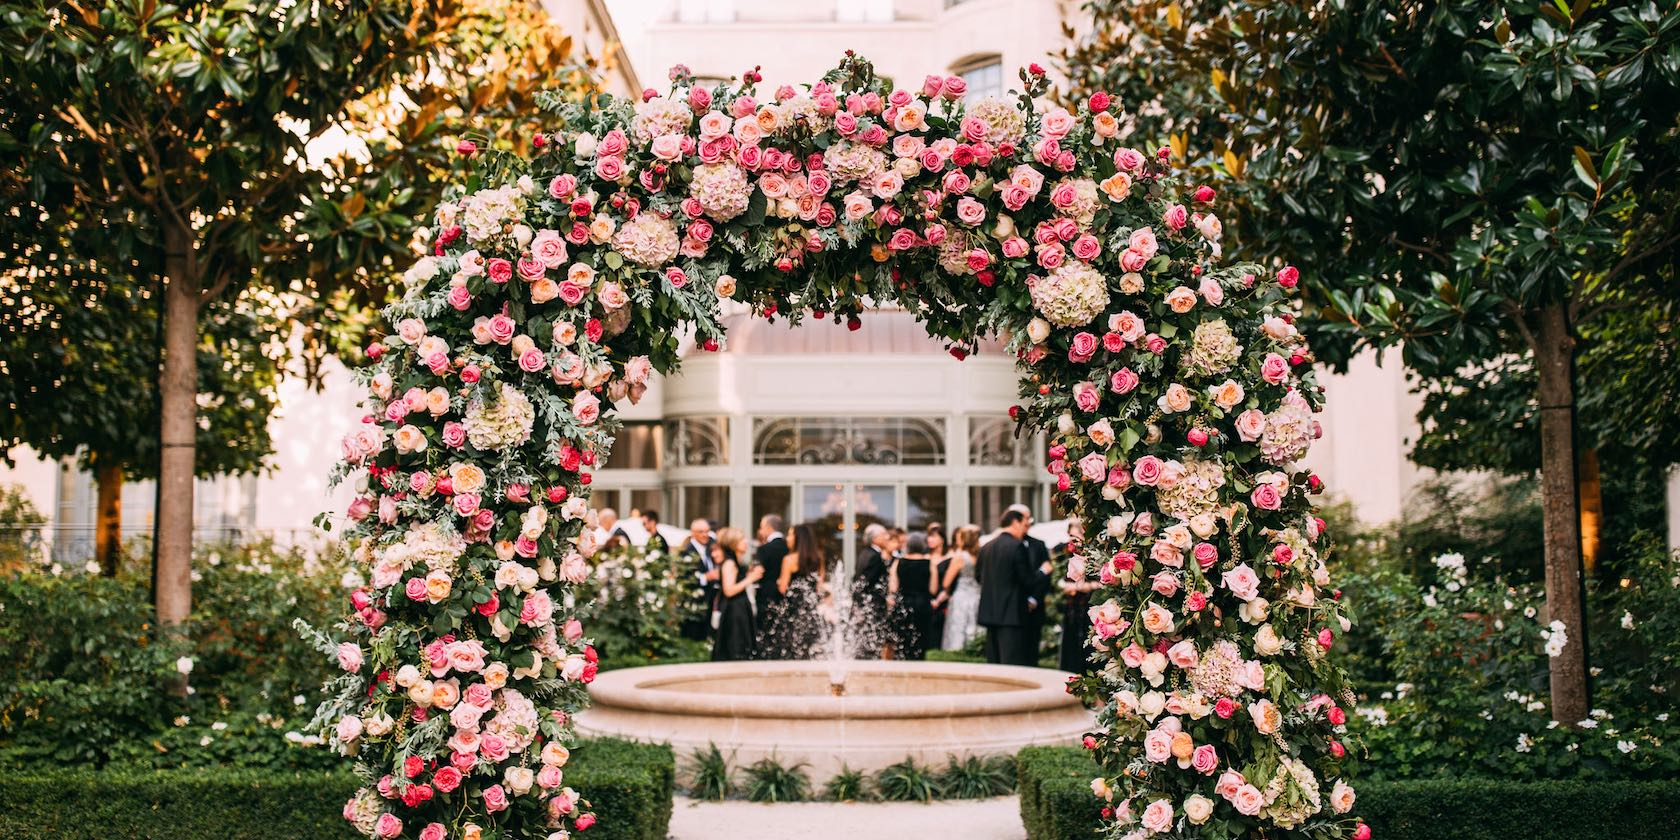 Wedding planner Ritz Paris Fête in France